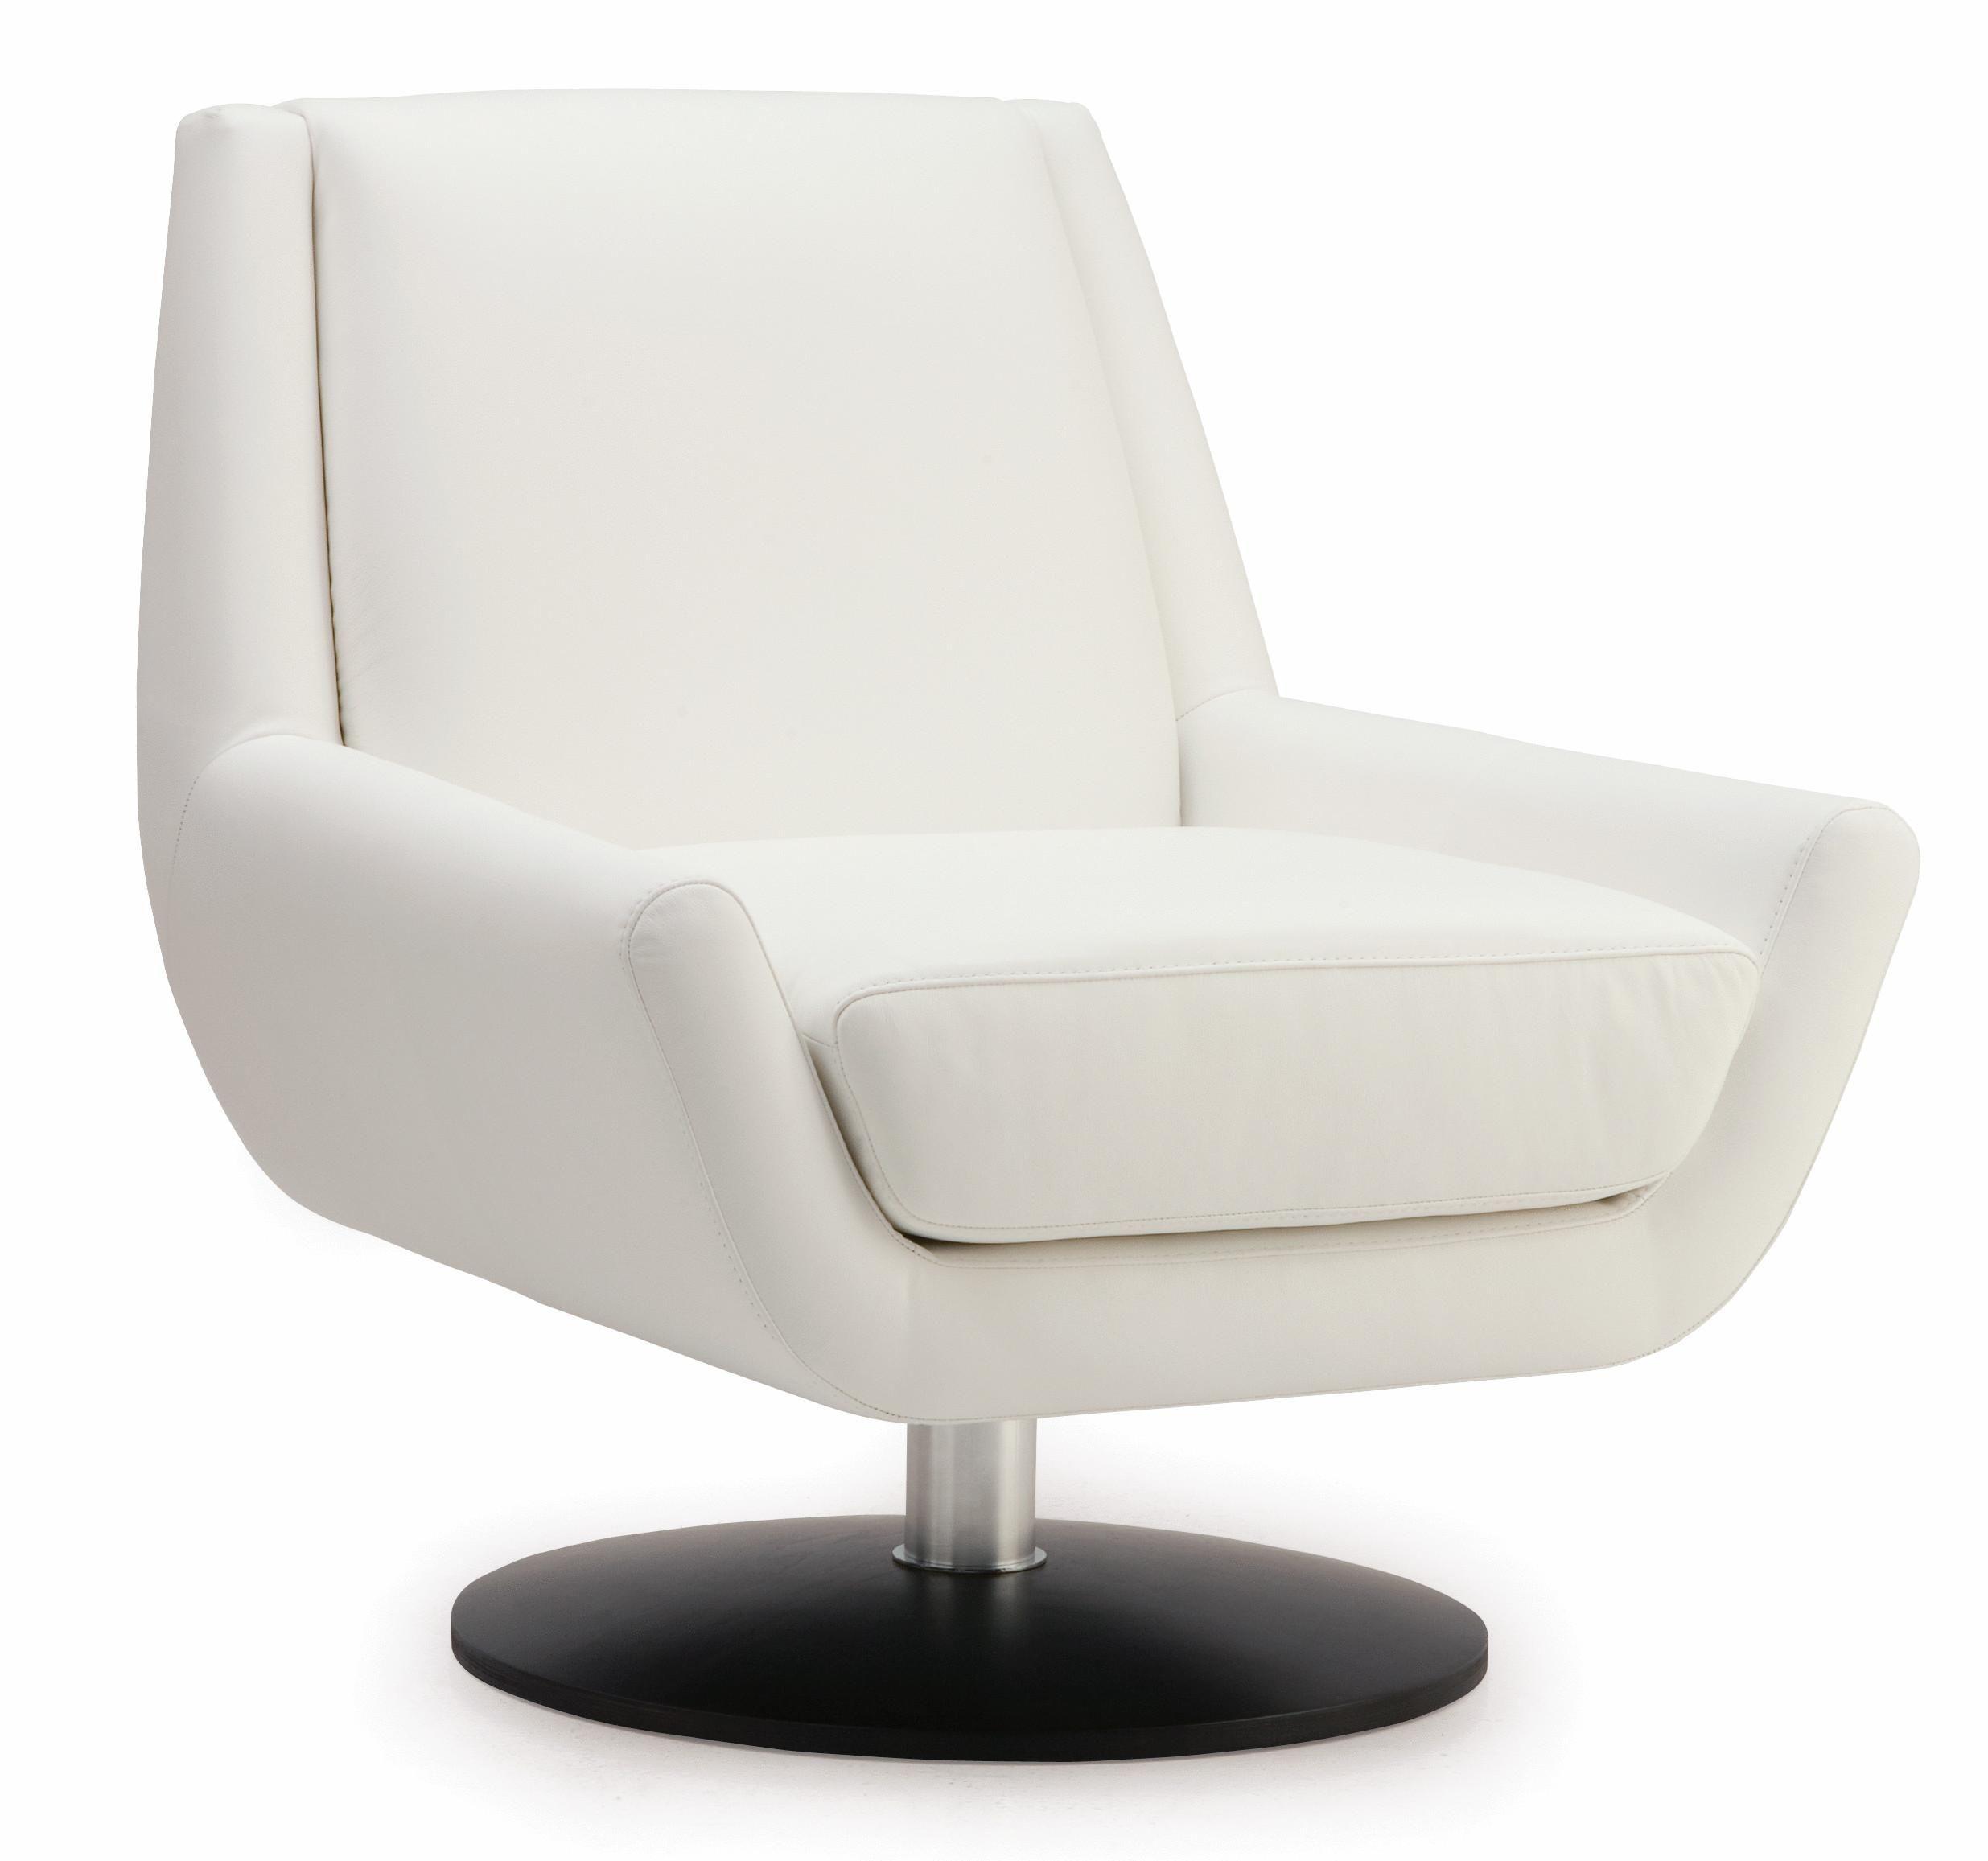 Plato Swivel Chair by Palliser Exceptional Palliser